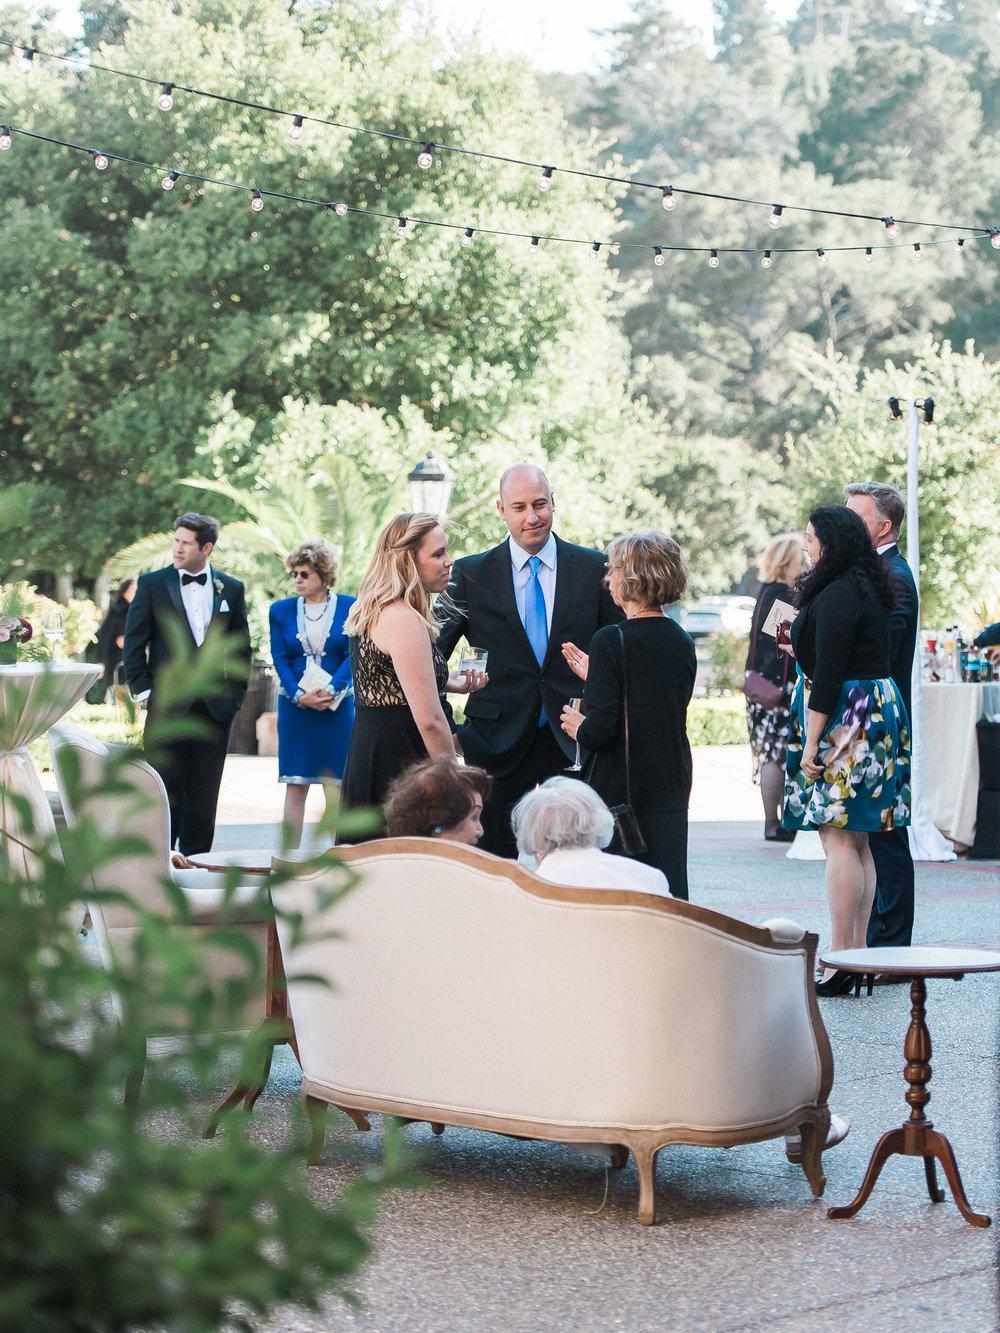 Sarah+Warren_wedding_spp-93.jpg